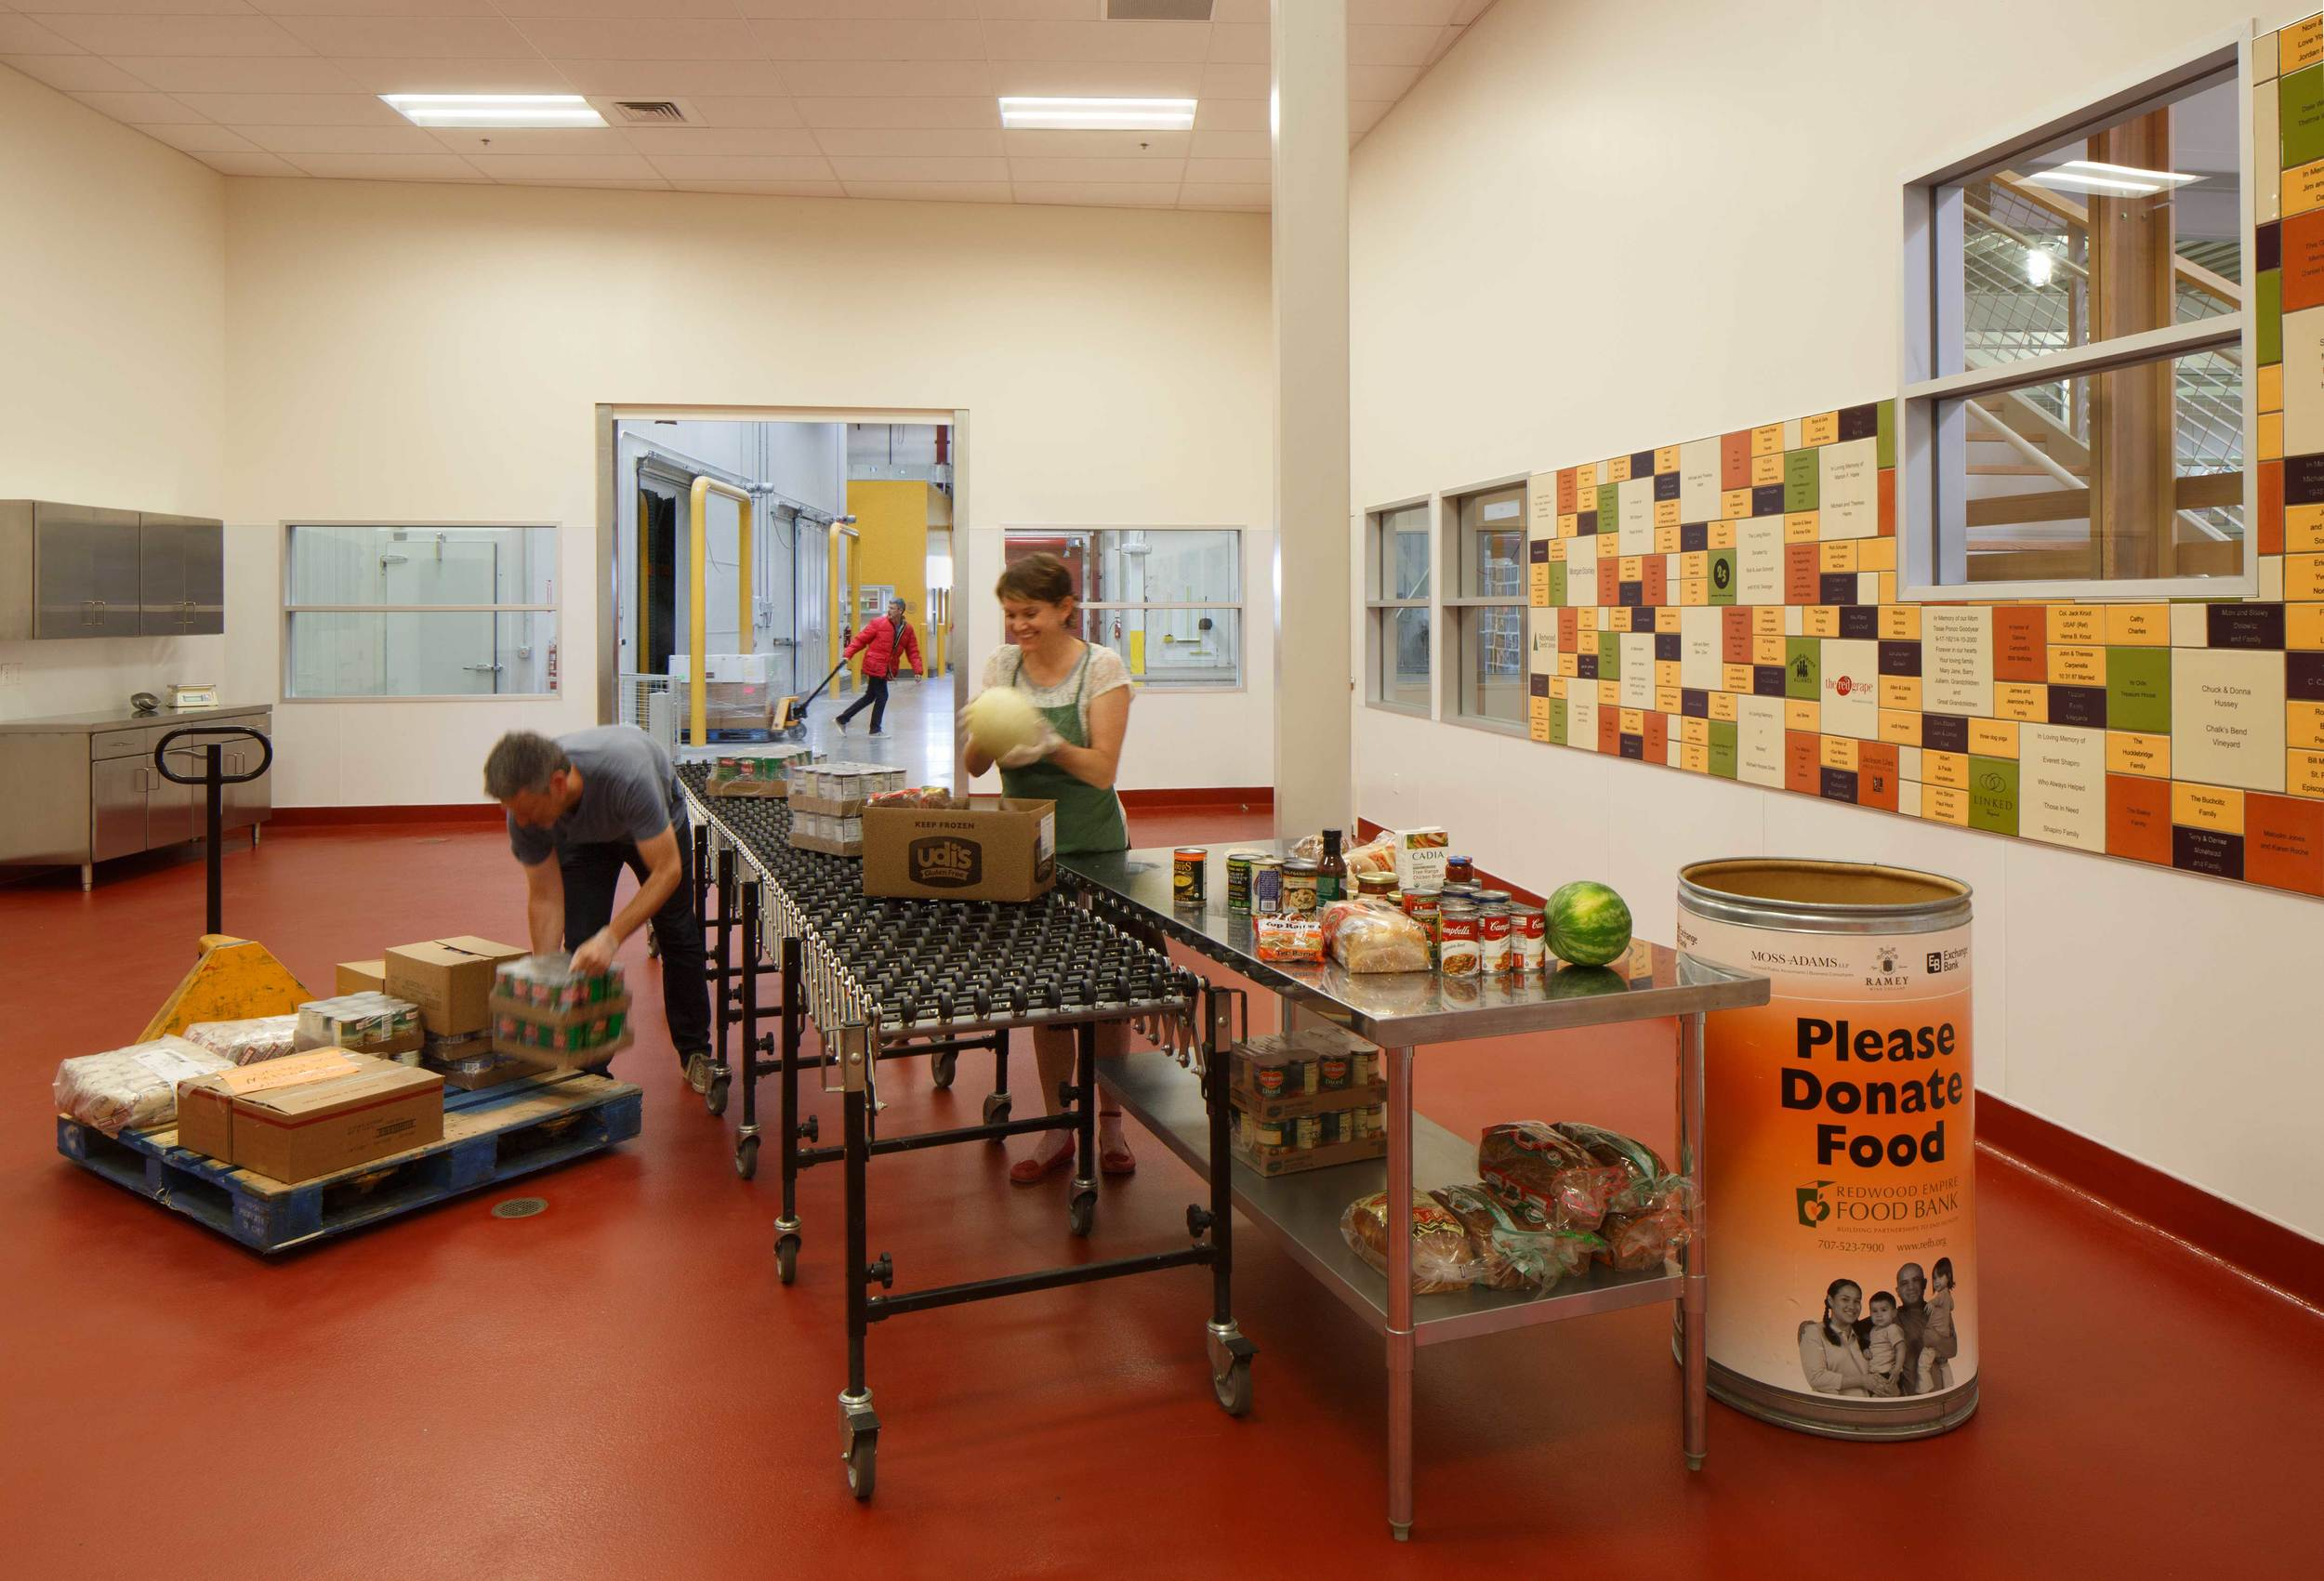 Volunteer Action Center